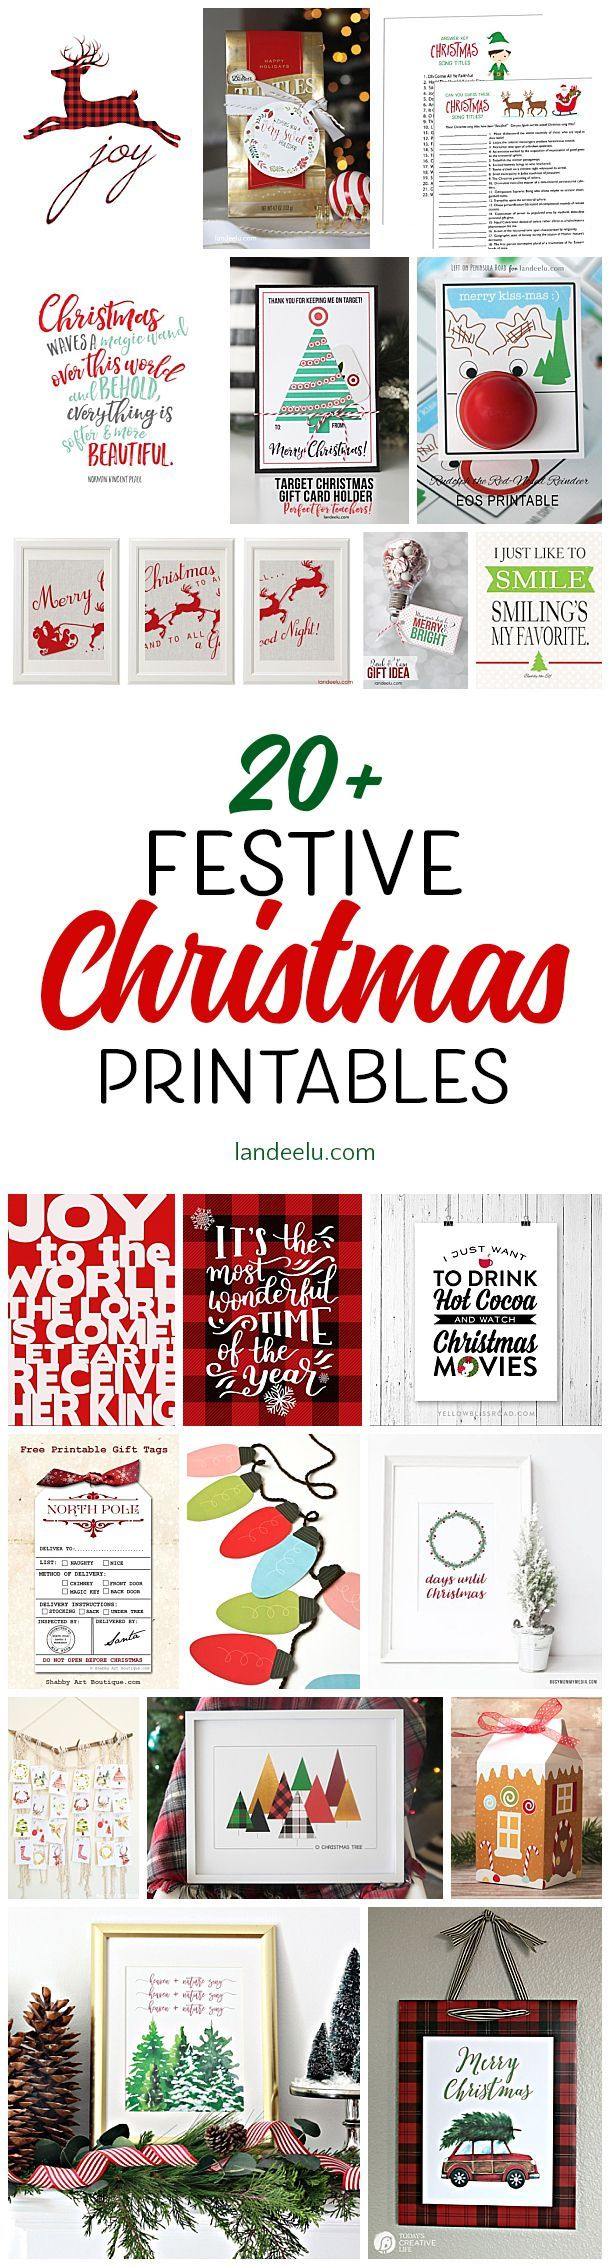 Over 20 festive + free Christmas printables to help deck the halls!